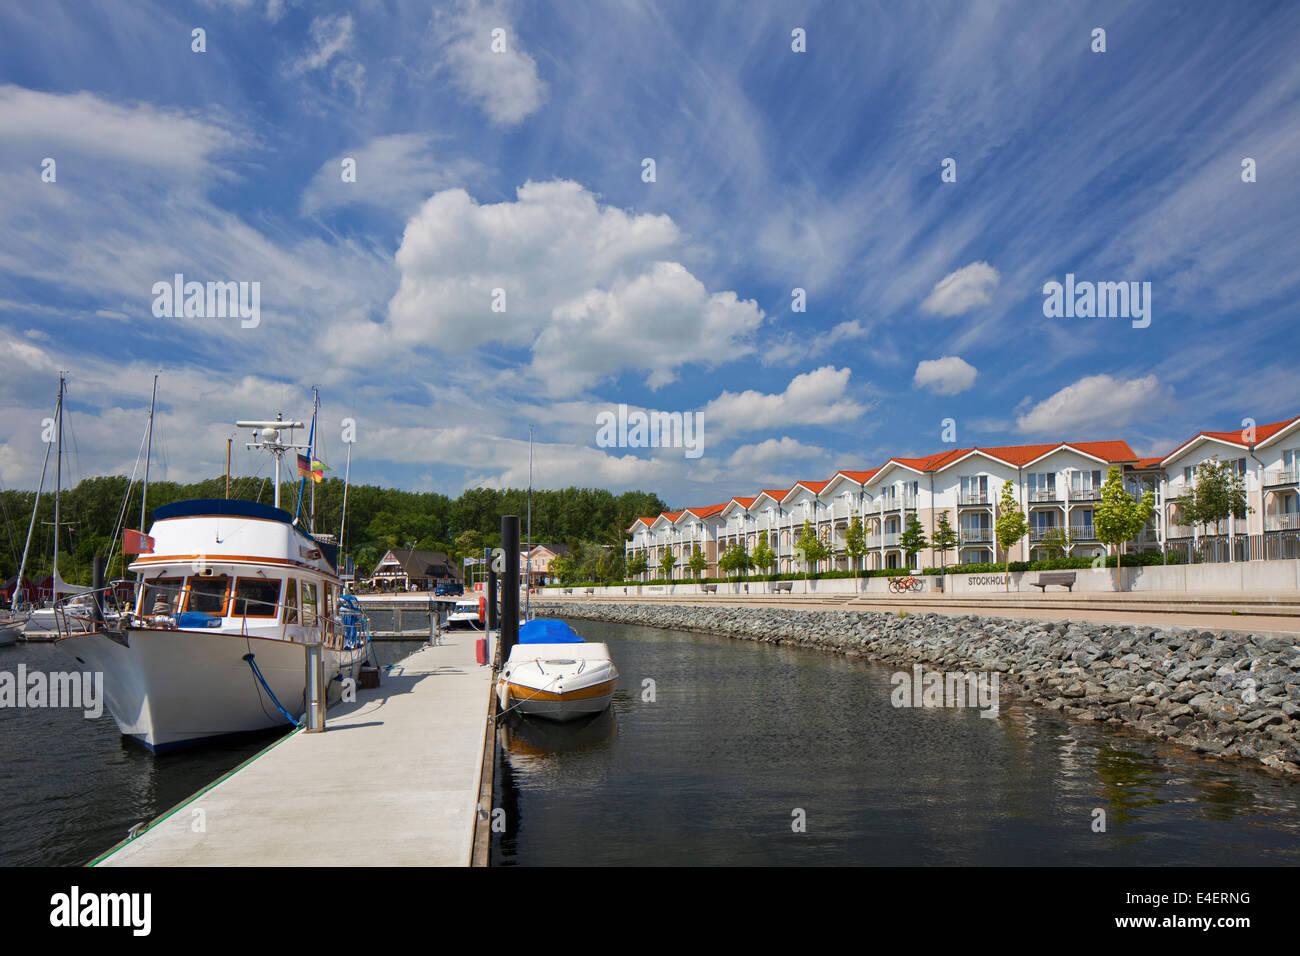 Pleasure boats docked in marina of the holiday resort Weisse Wiek / Weiße Wiek at Boltenhagen, Mecklenburg - Stock Image